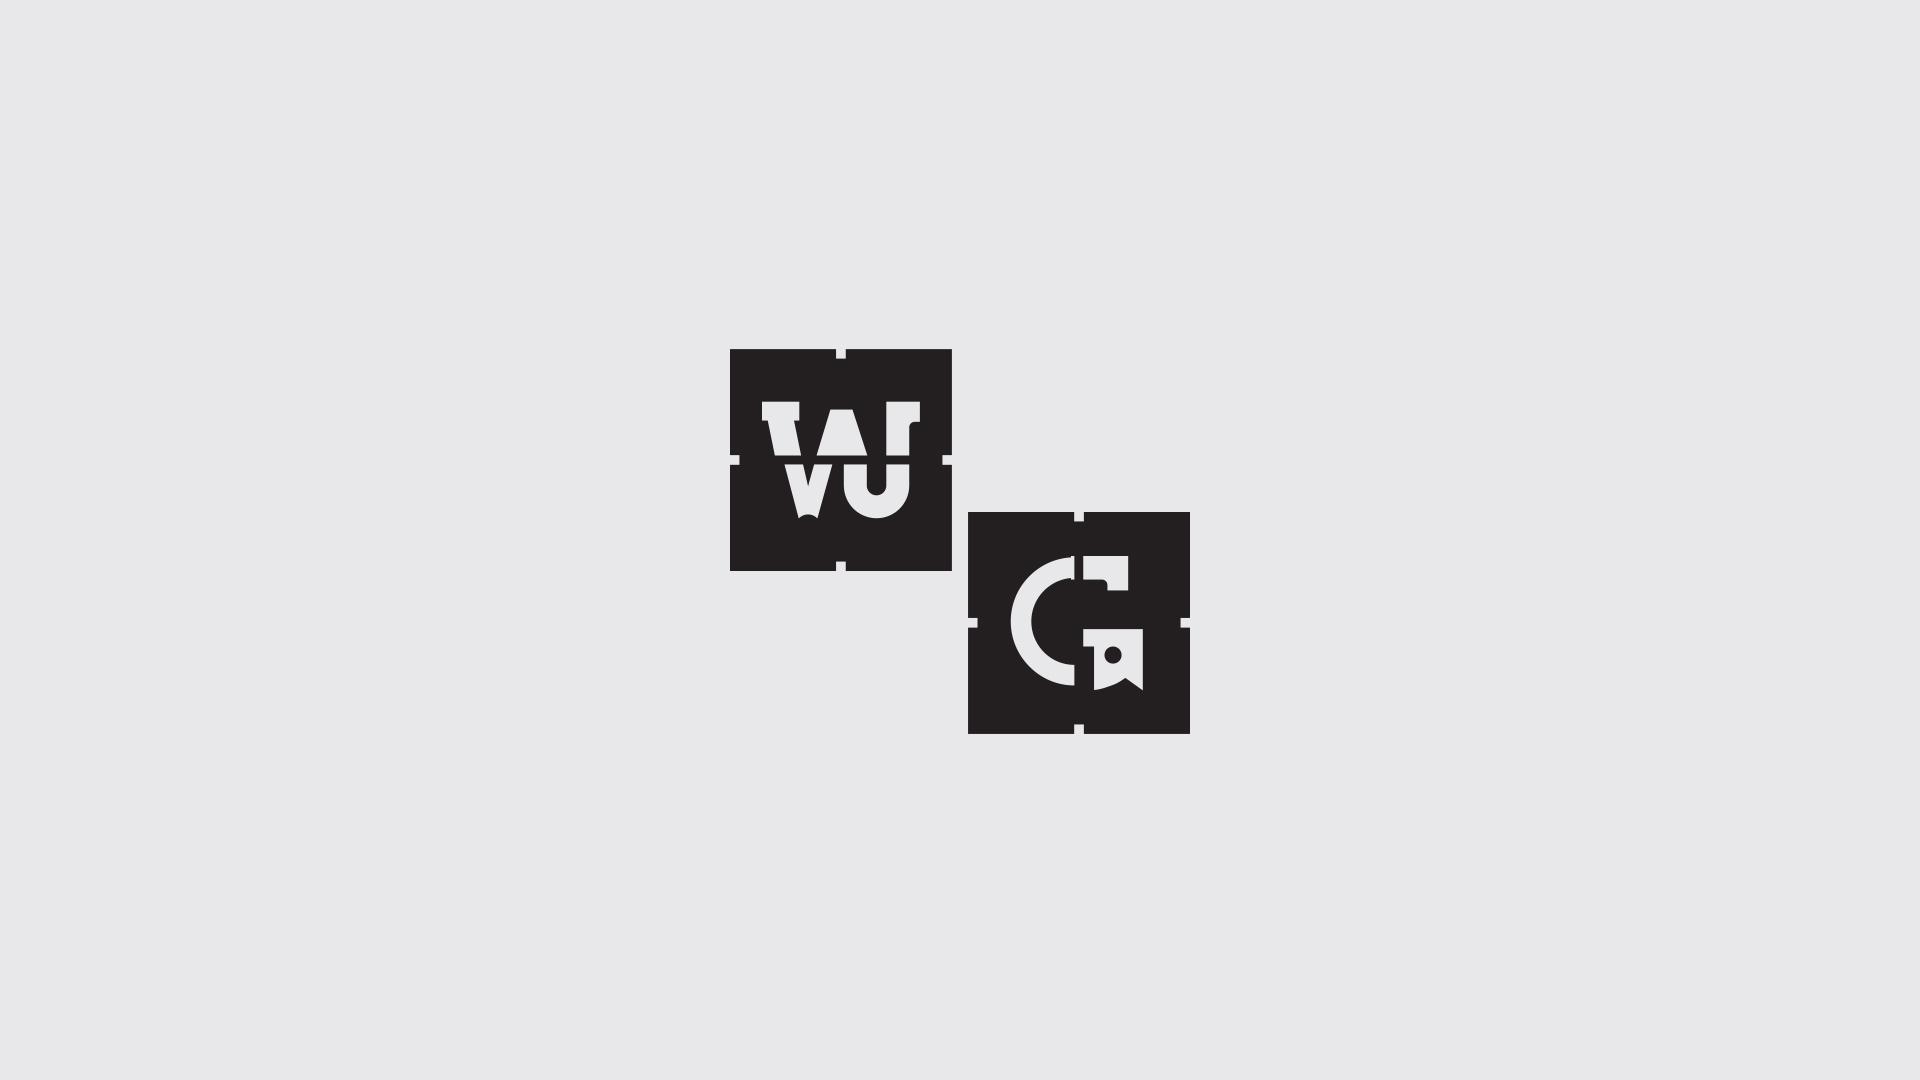 Gibside National Trust - Walled Garden, Identity -  image for Gibside National Trust – Walled Garden project